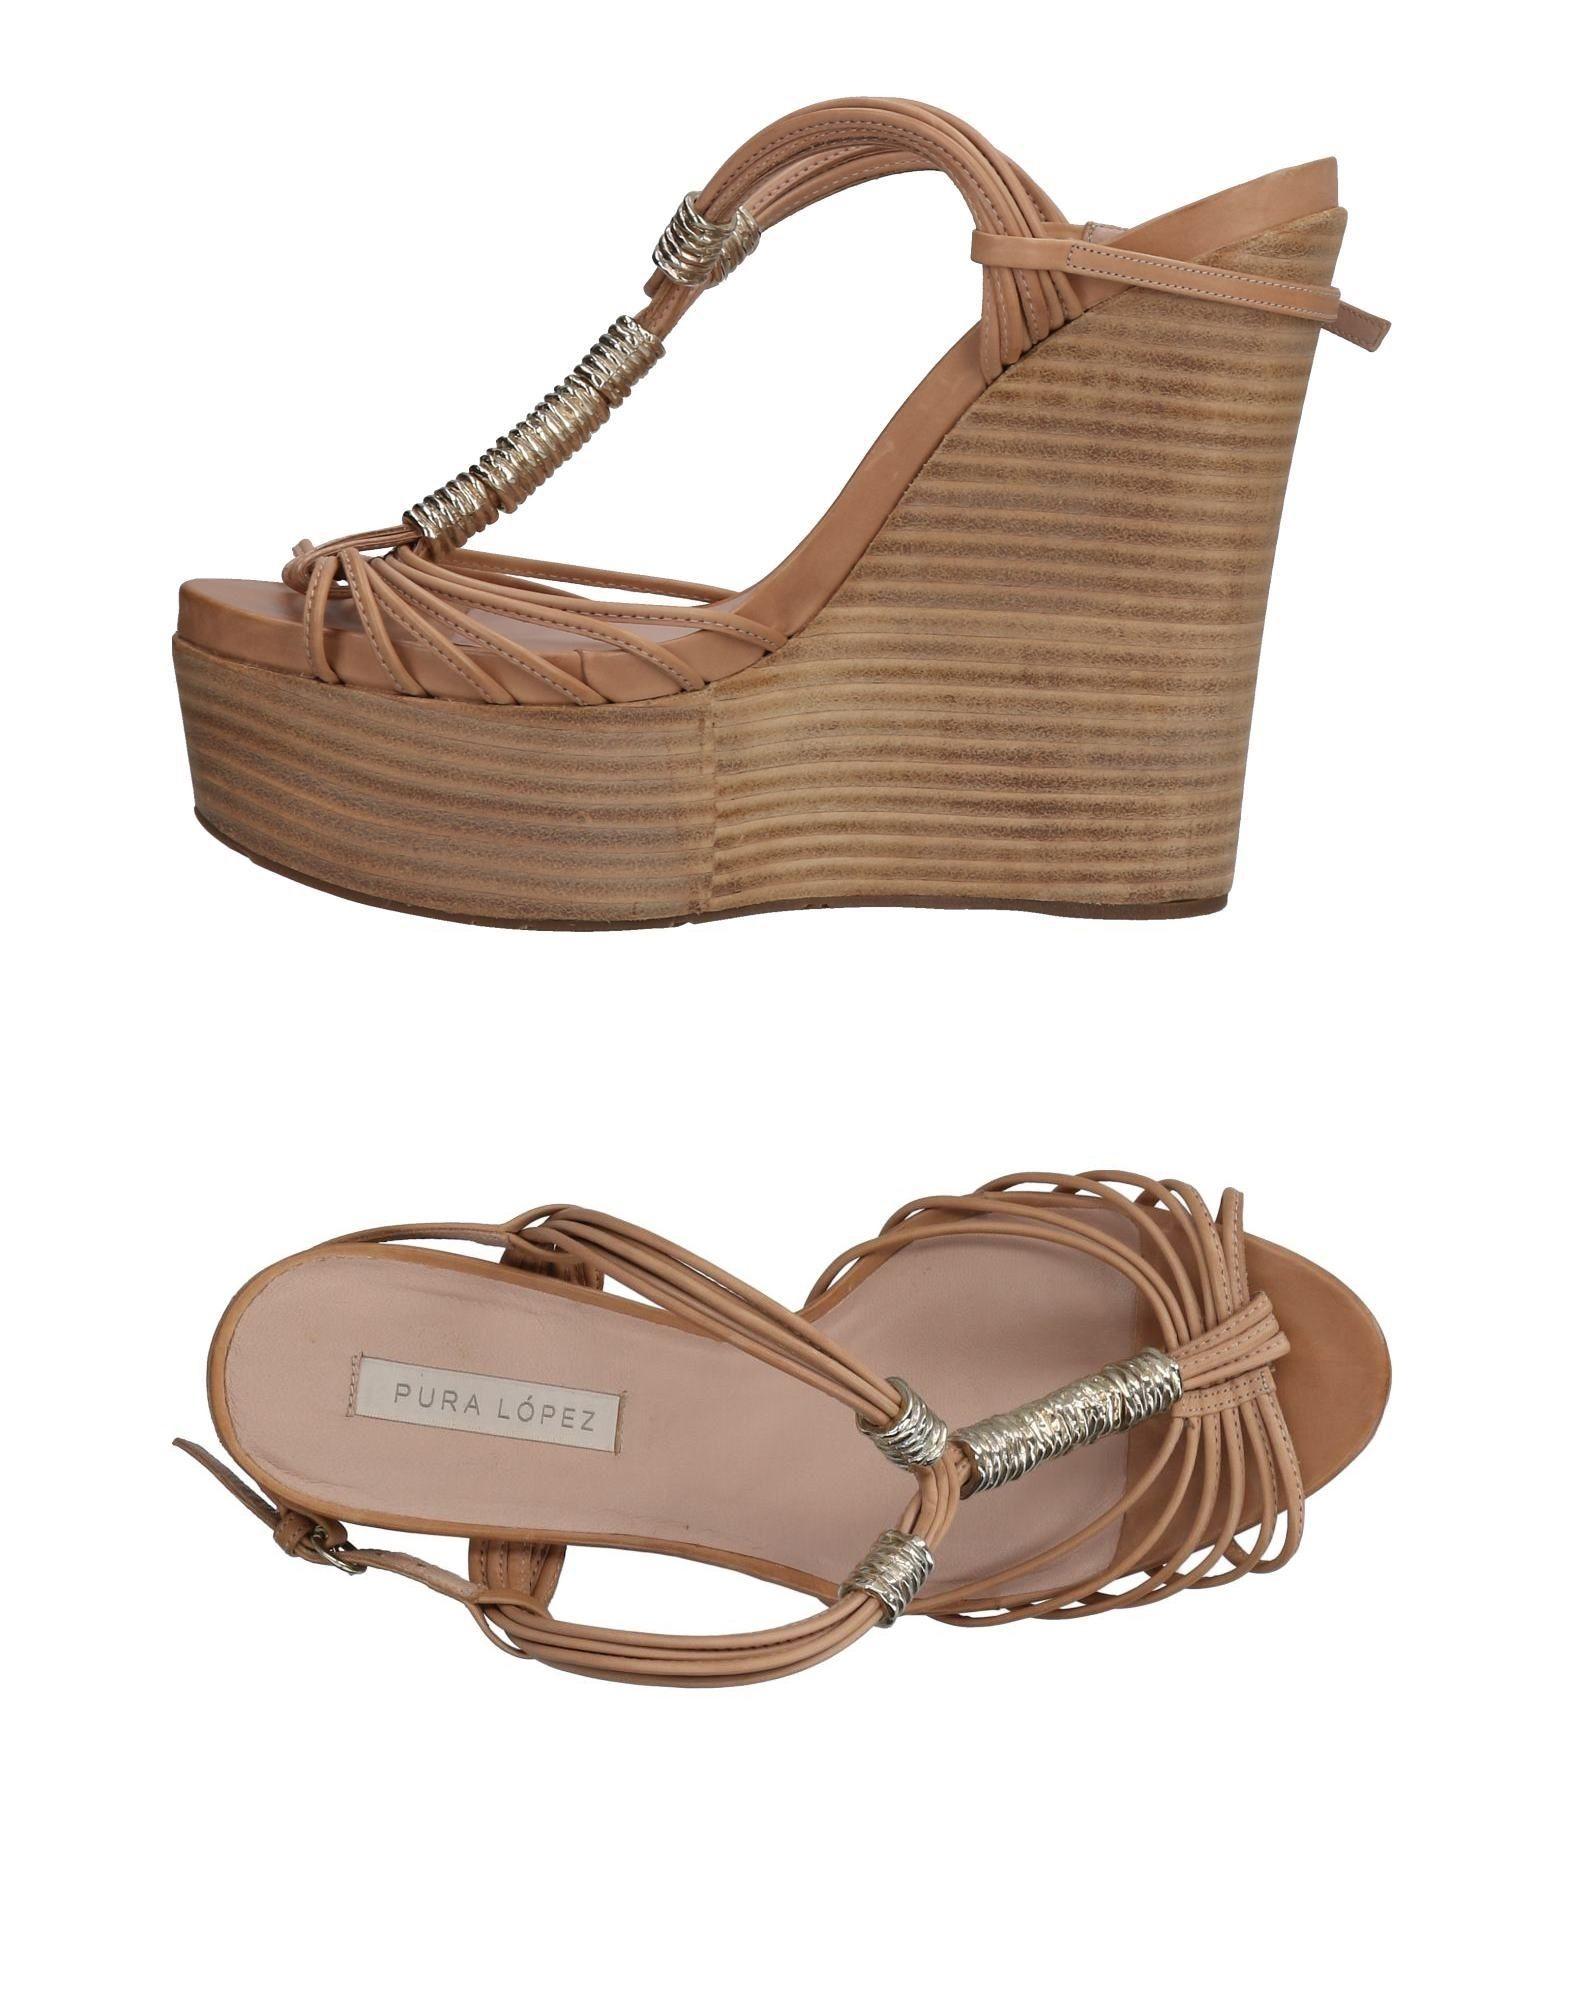 Stilvolle billige Sandalen Schuhe Pura López Sandalen billige Damen  11472524GF c66de0